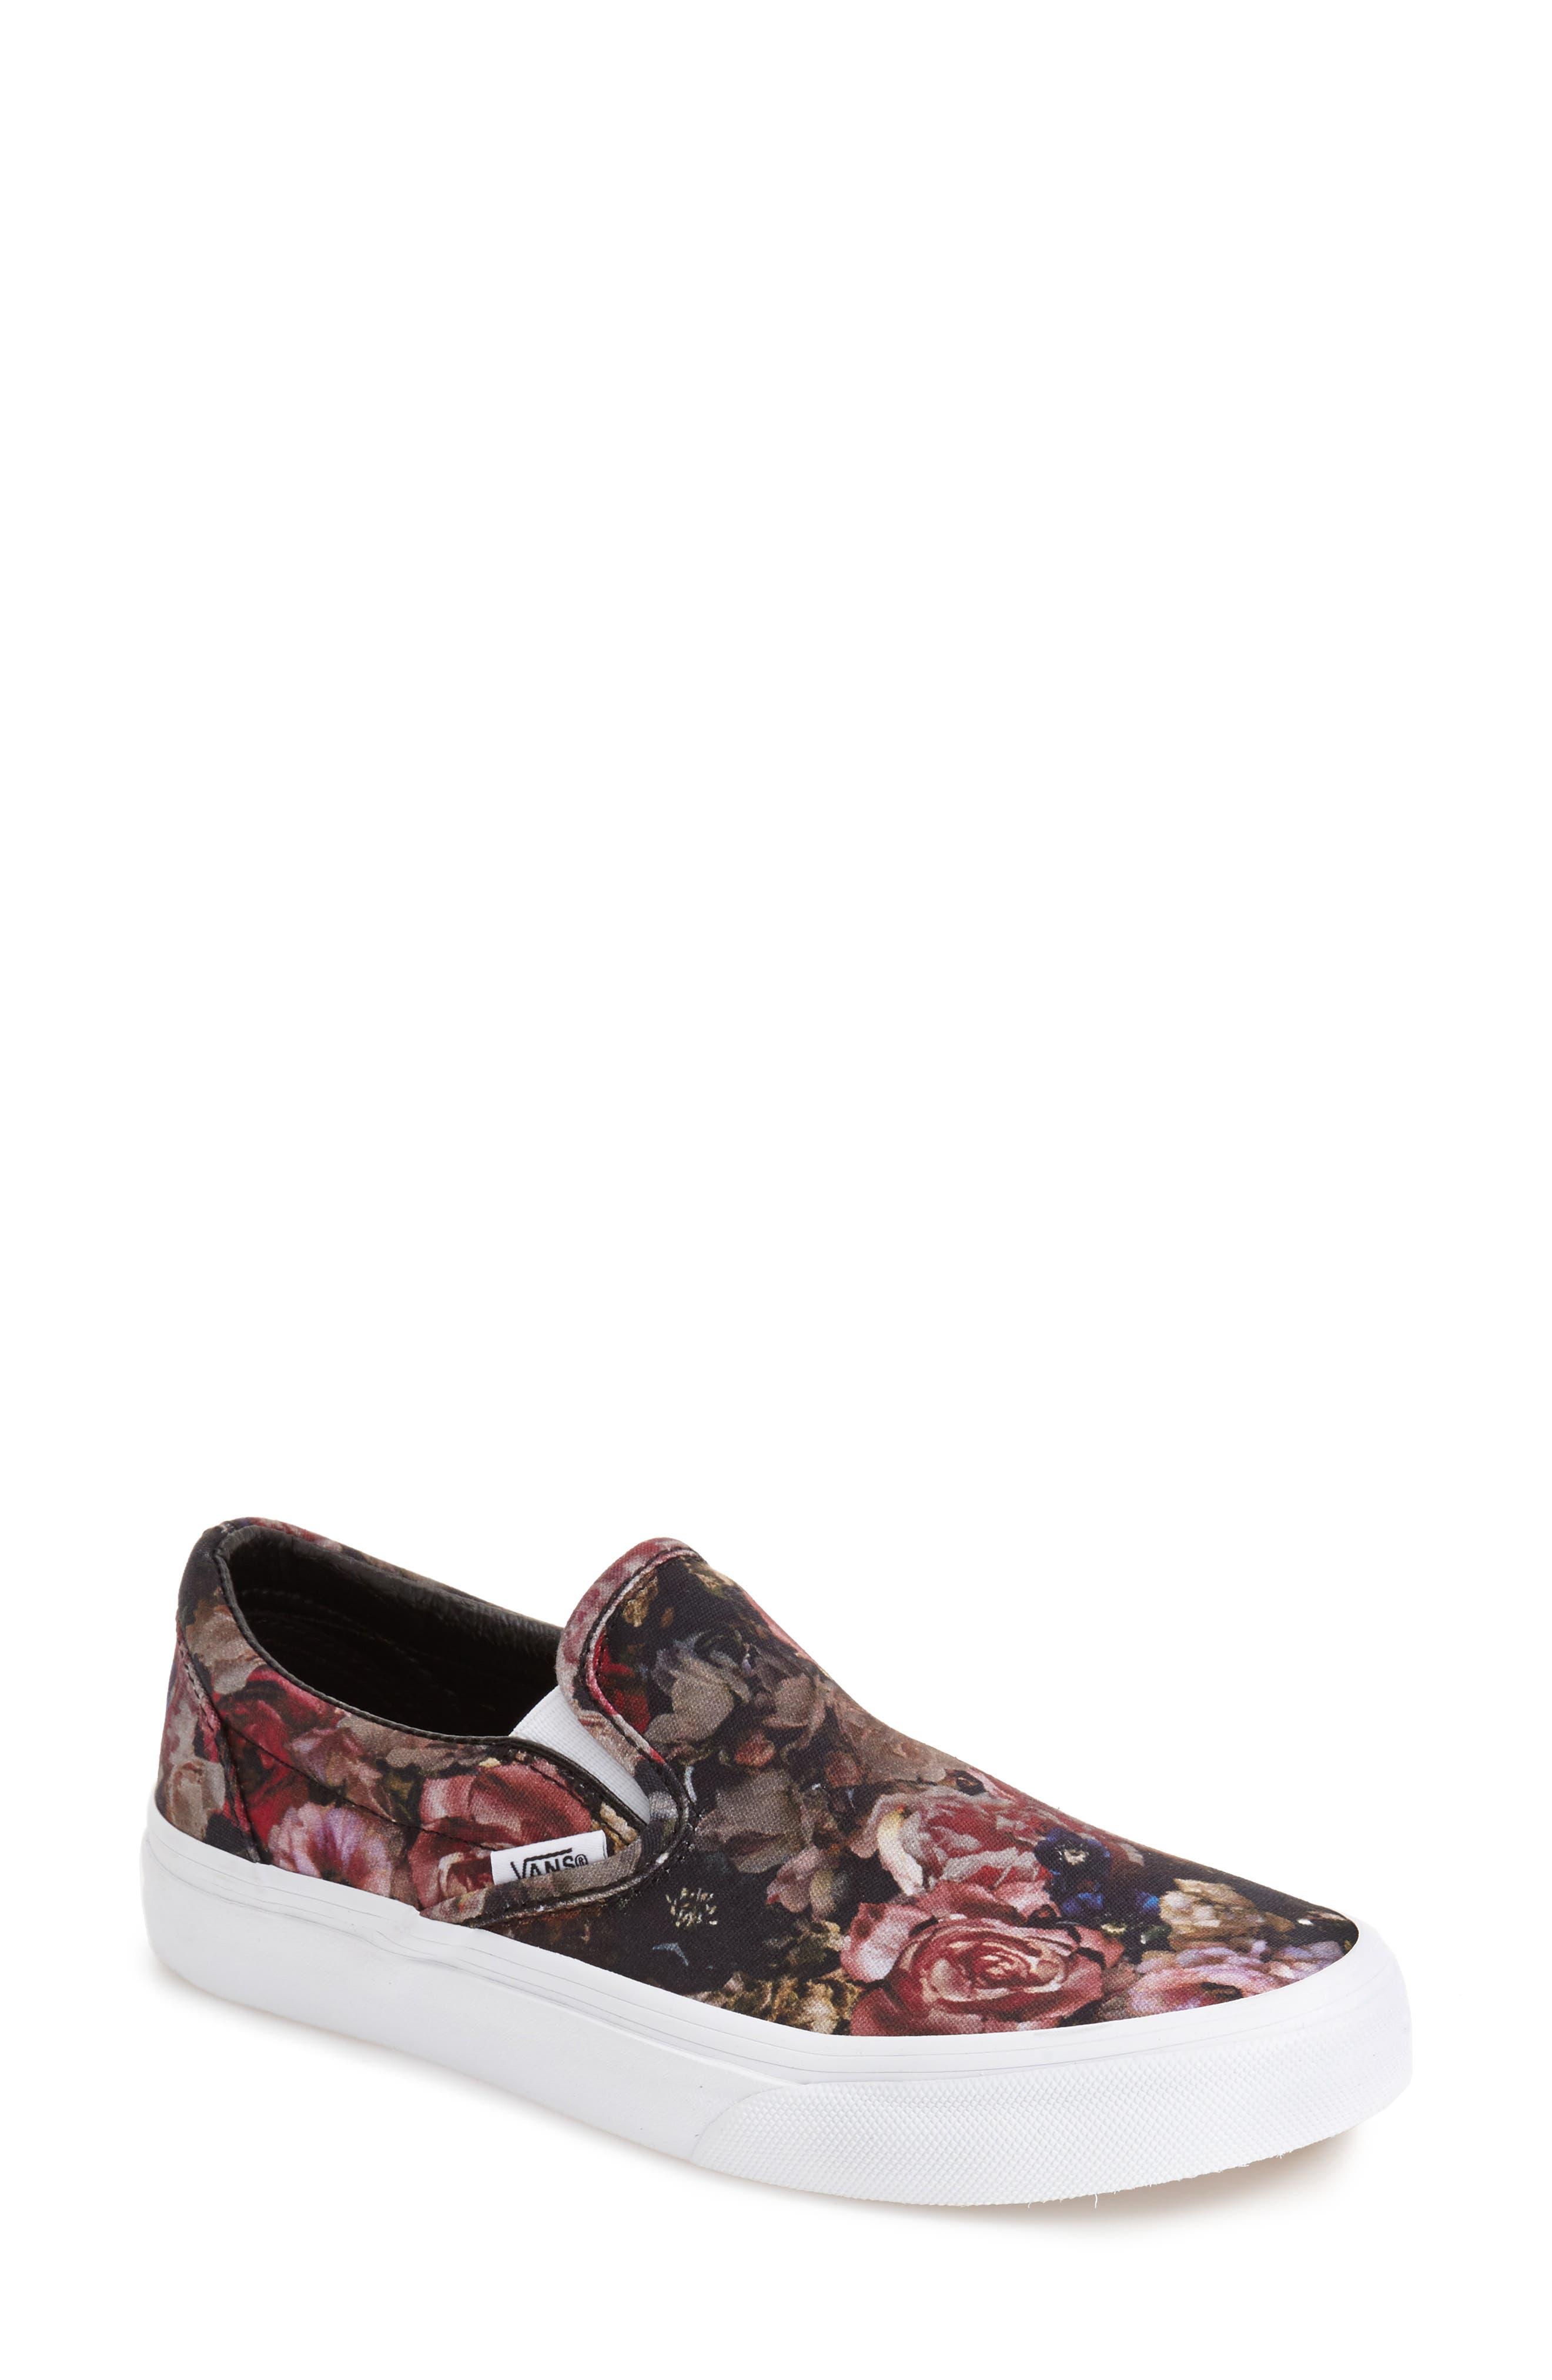 ,                             Classic Slip-On Sneaker,                             Main thumbnail 247, color,                             004